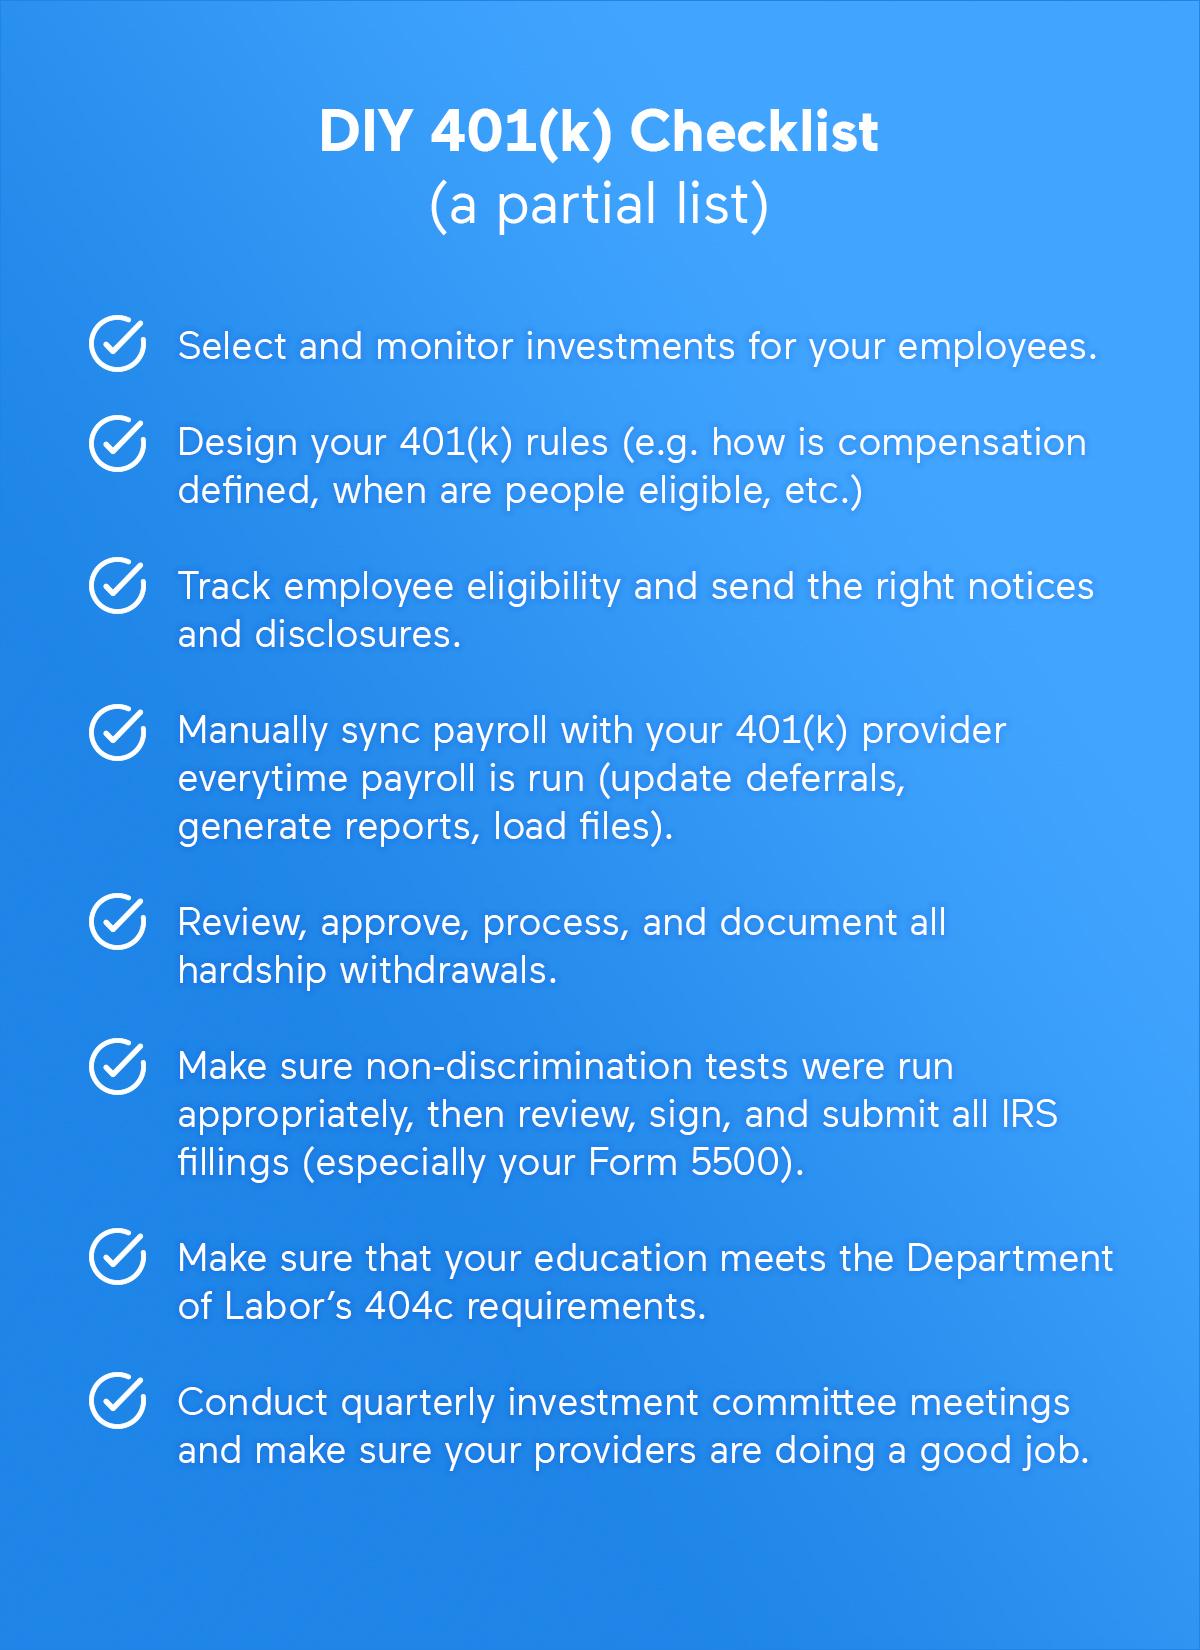 new-diy-checklist